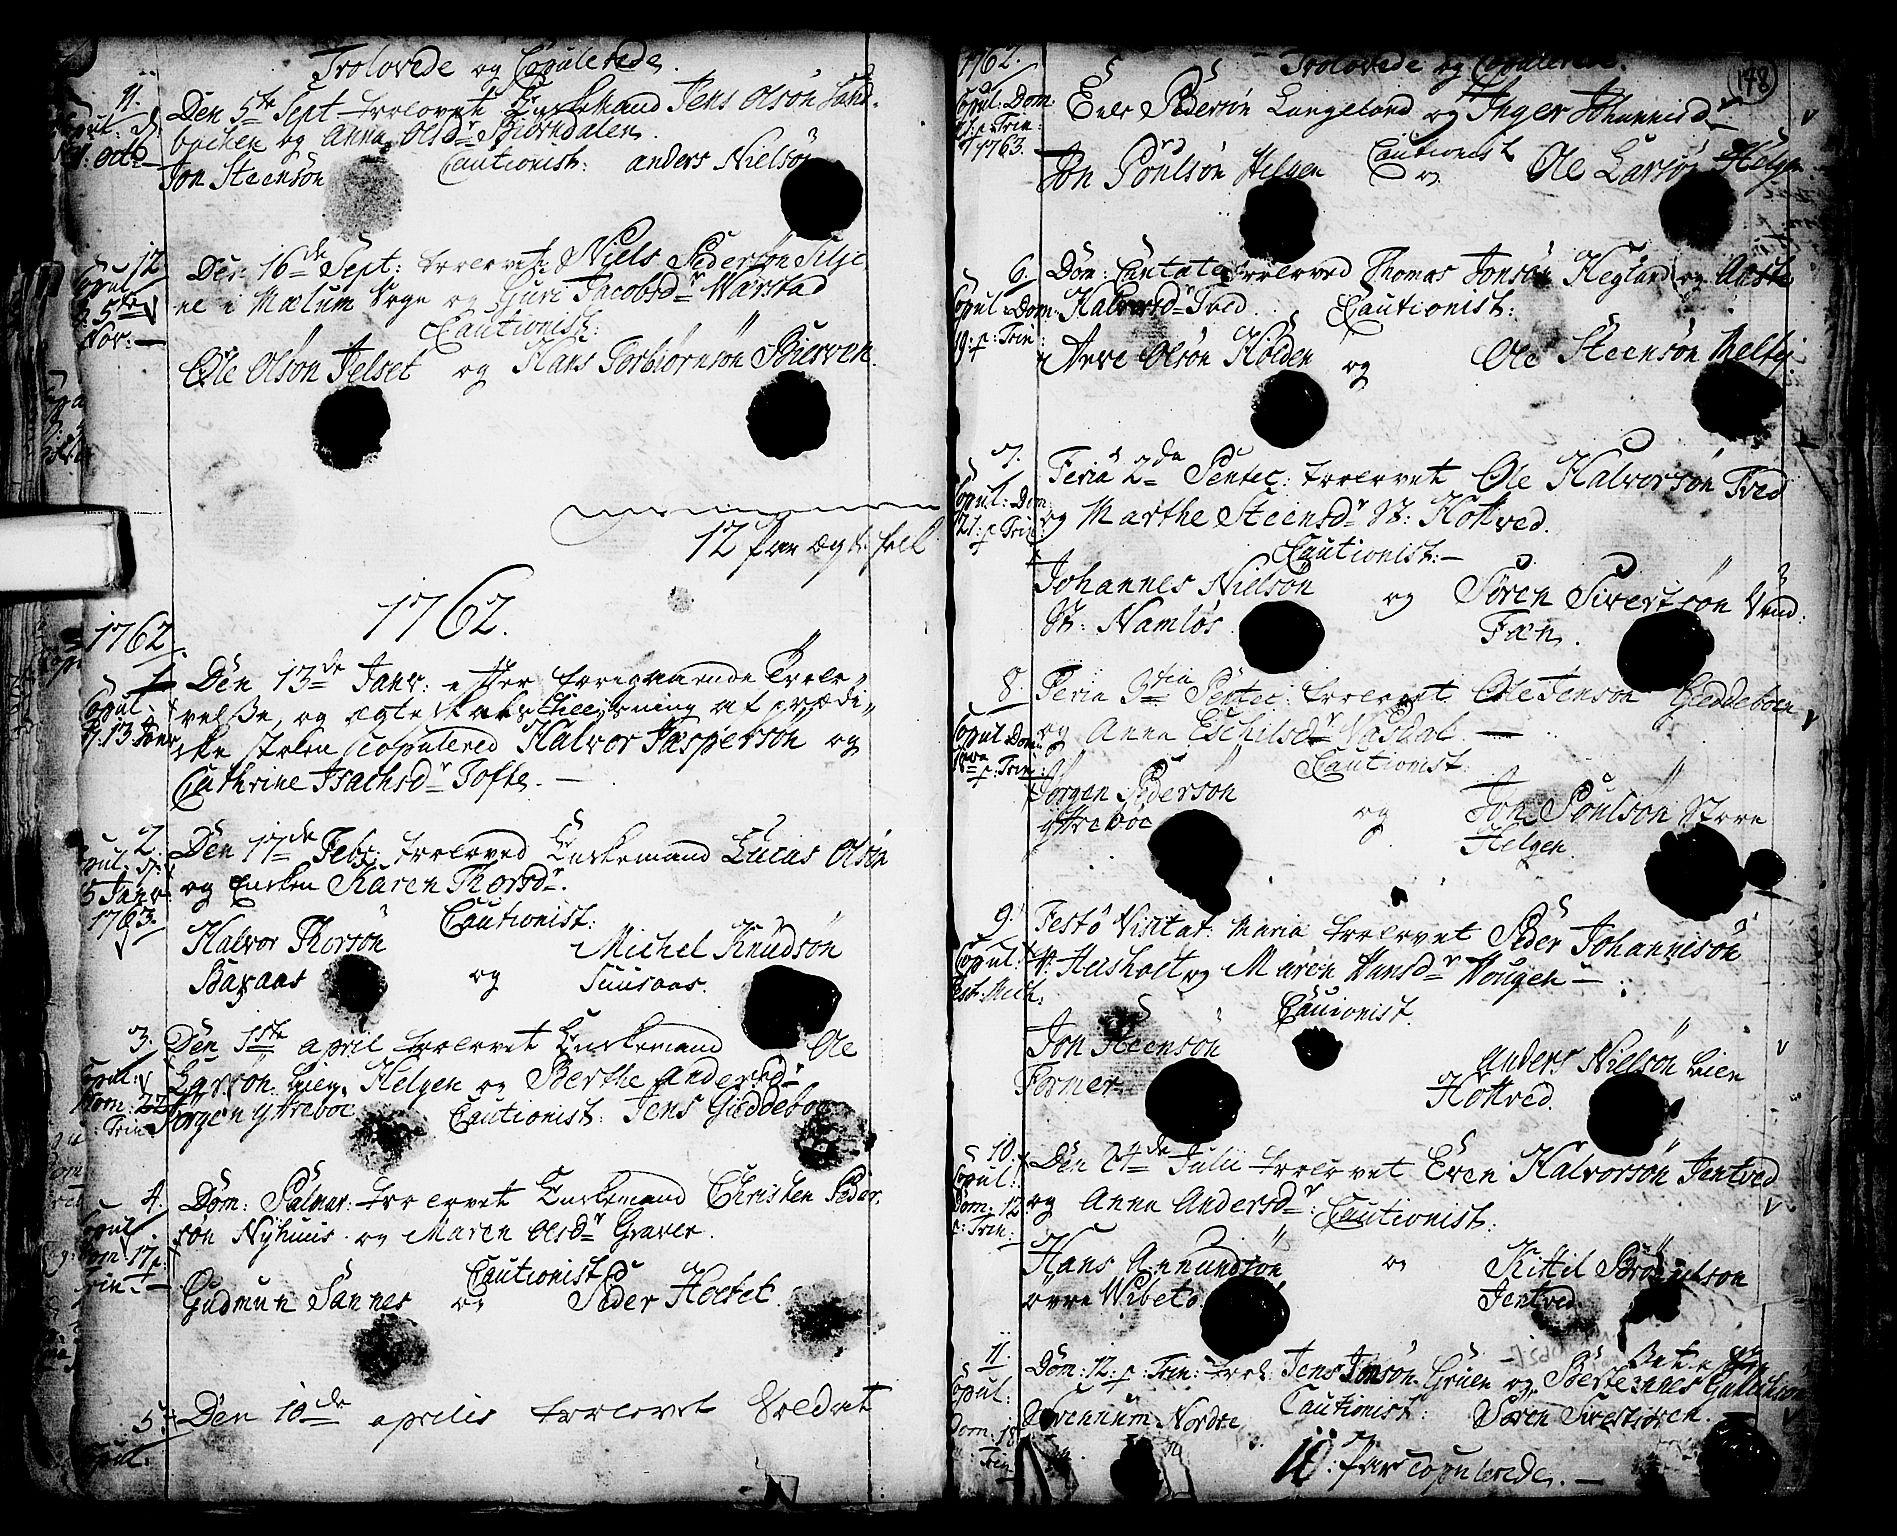 SAKO, Holla kirkebøker, F/Fa/L0001: Ministerialbok nr. 1, 1717-1779, s. 178